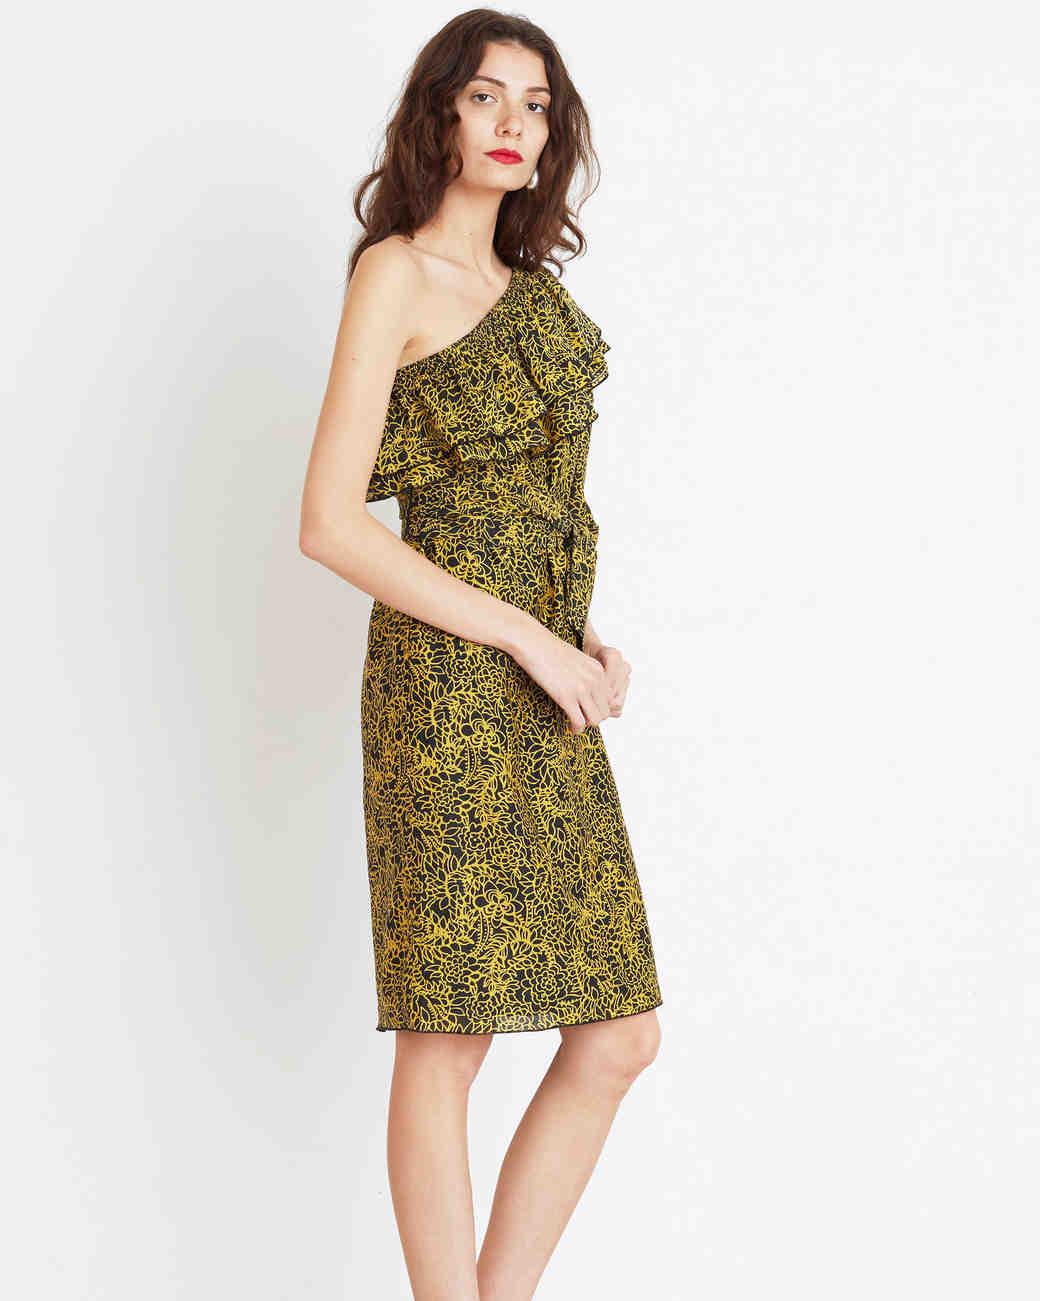 36 Beautiful Dresses To Wear As A Wedding Guest This Fall   Martha Stewart  Weddings